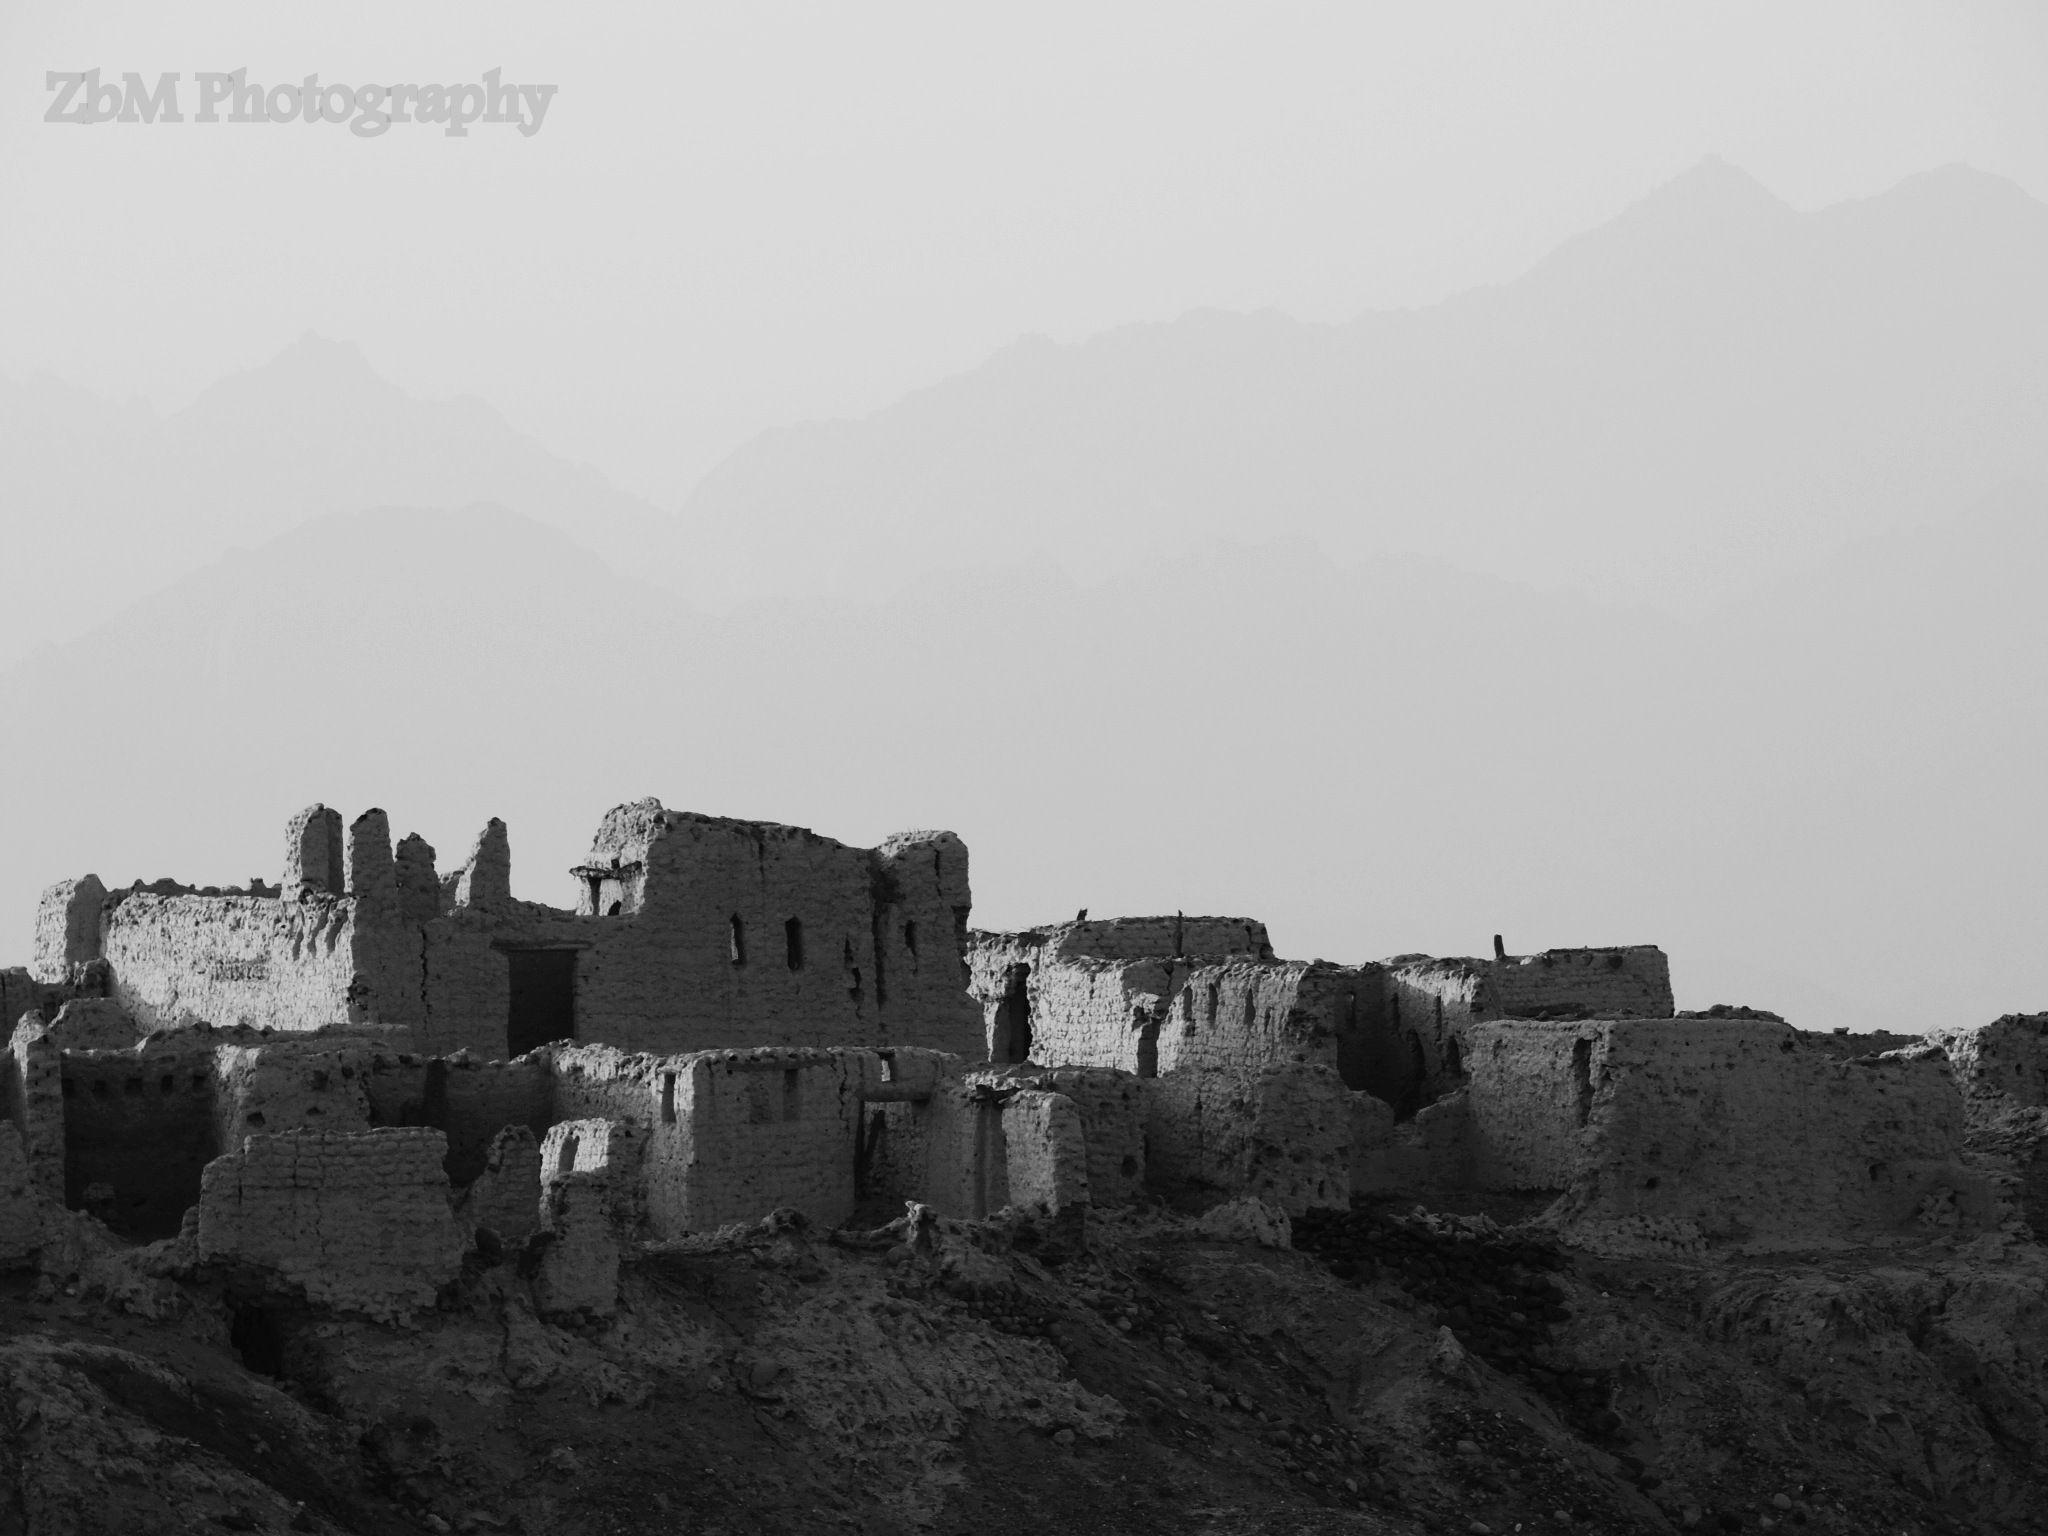 Near the ruins of an old village yanbu al nakhal saudi arabia